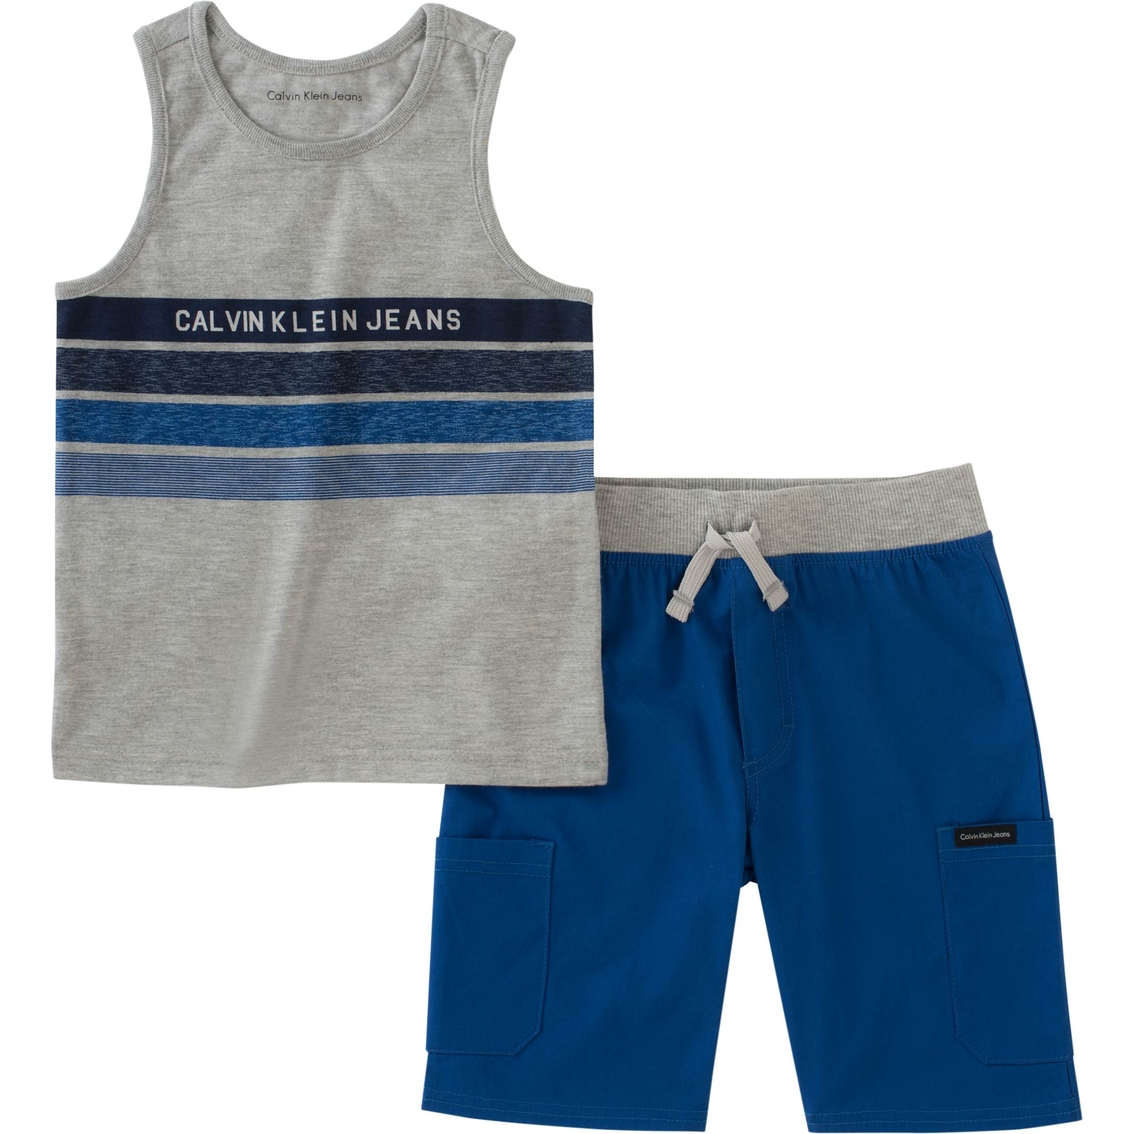 763b0c323e Calvin Klein Toddler Boys Heather Jersey Tank And Shorts 2 Pc. Set ...